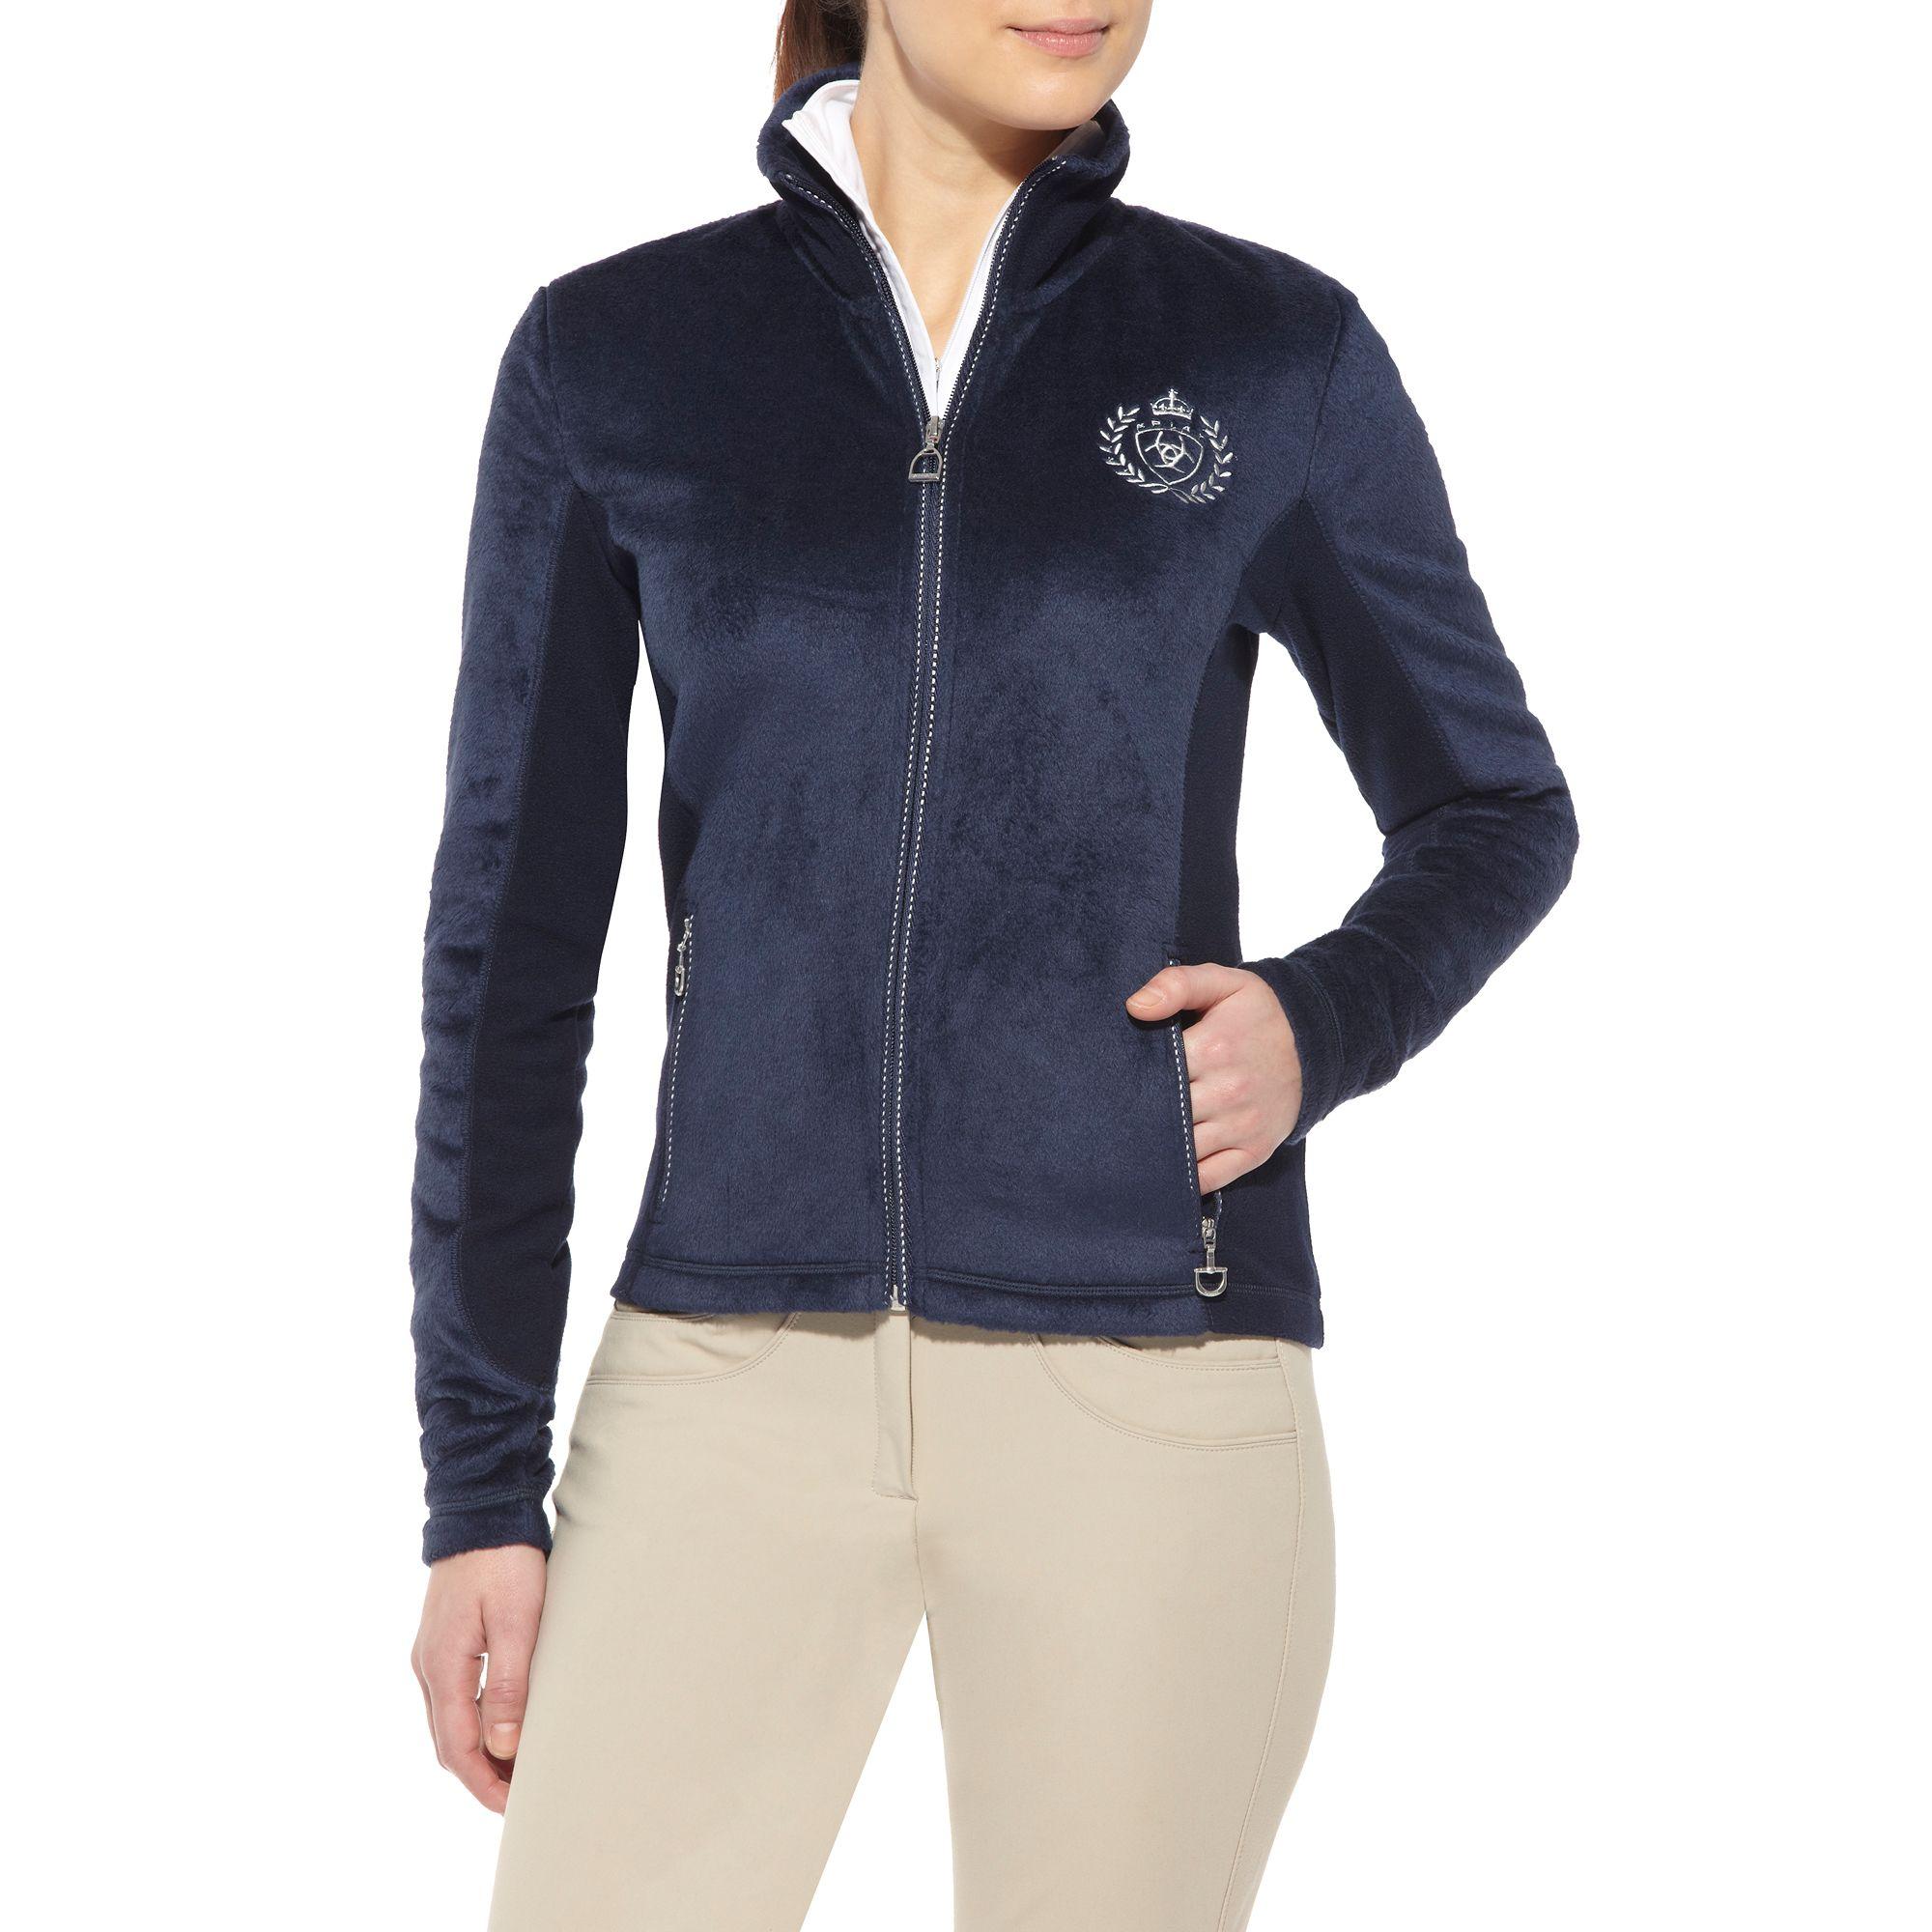 Ariat Stella Fleece Jacket - Ladies, Navy